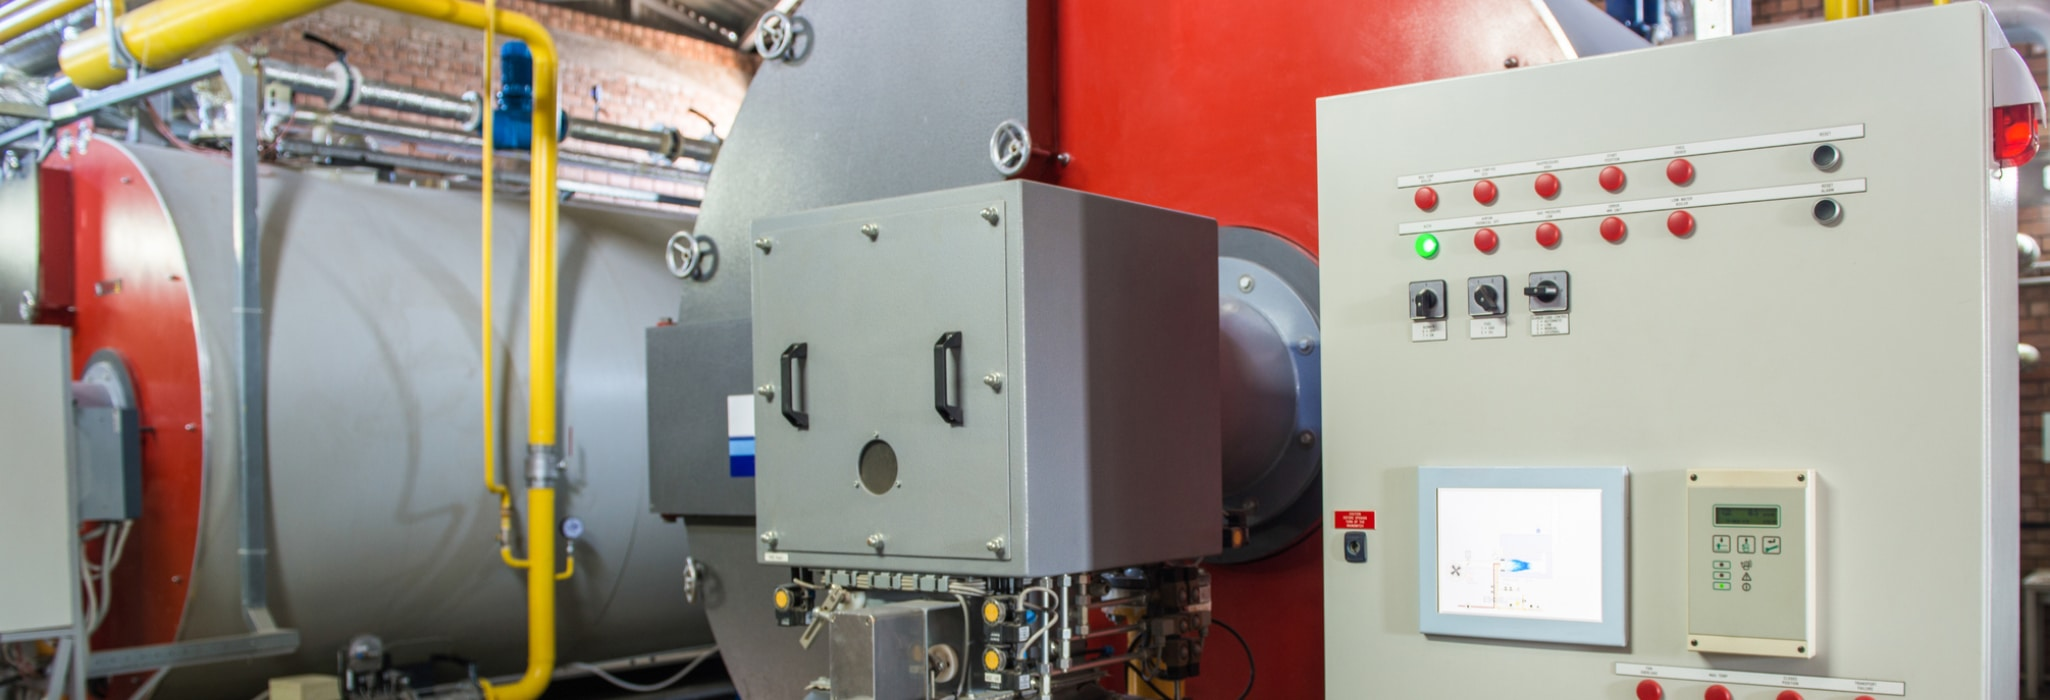 Boiler service.